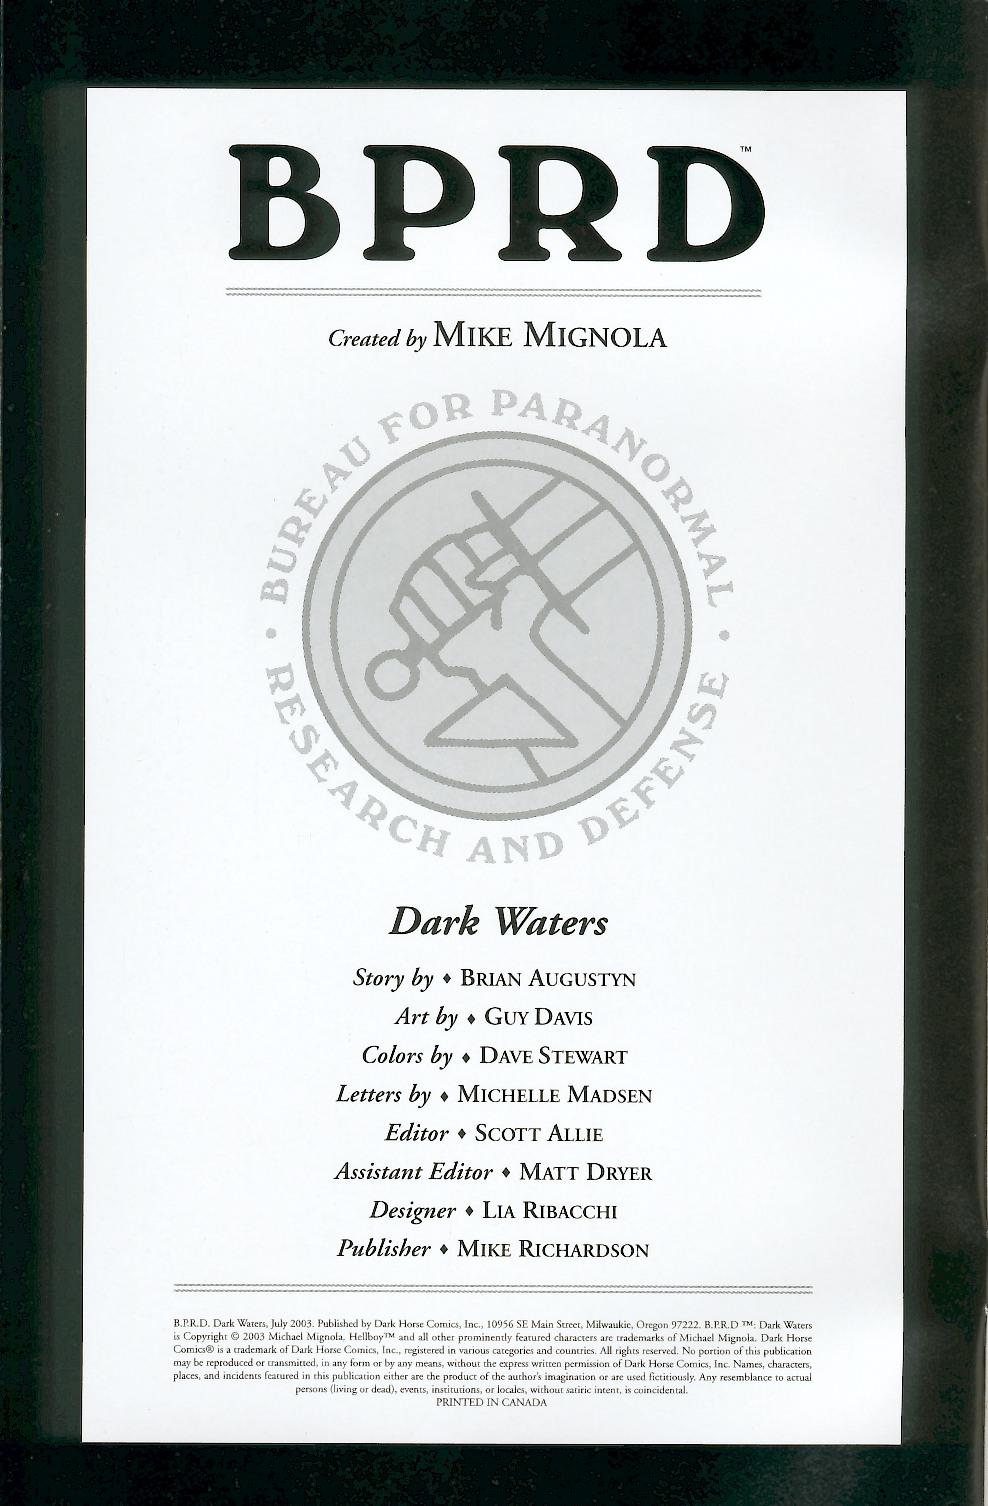 B.P.R.D.: Dark Waters Full Page 2